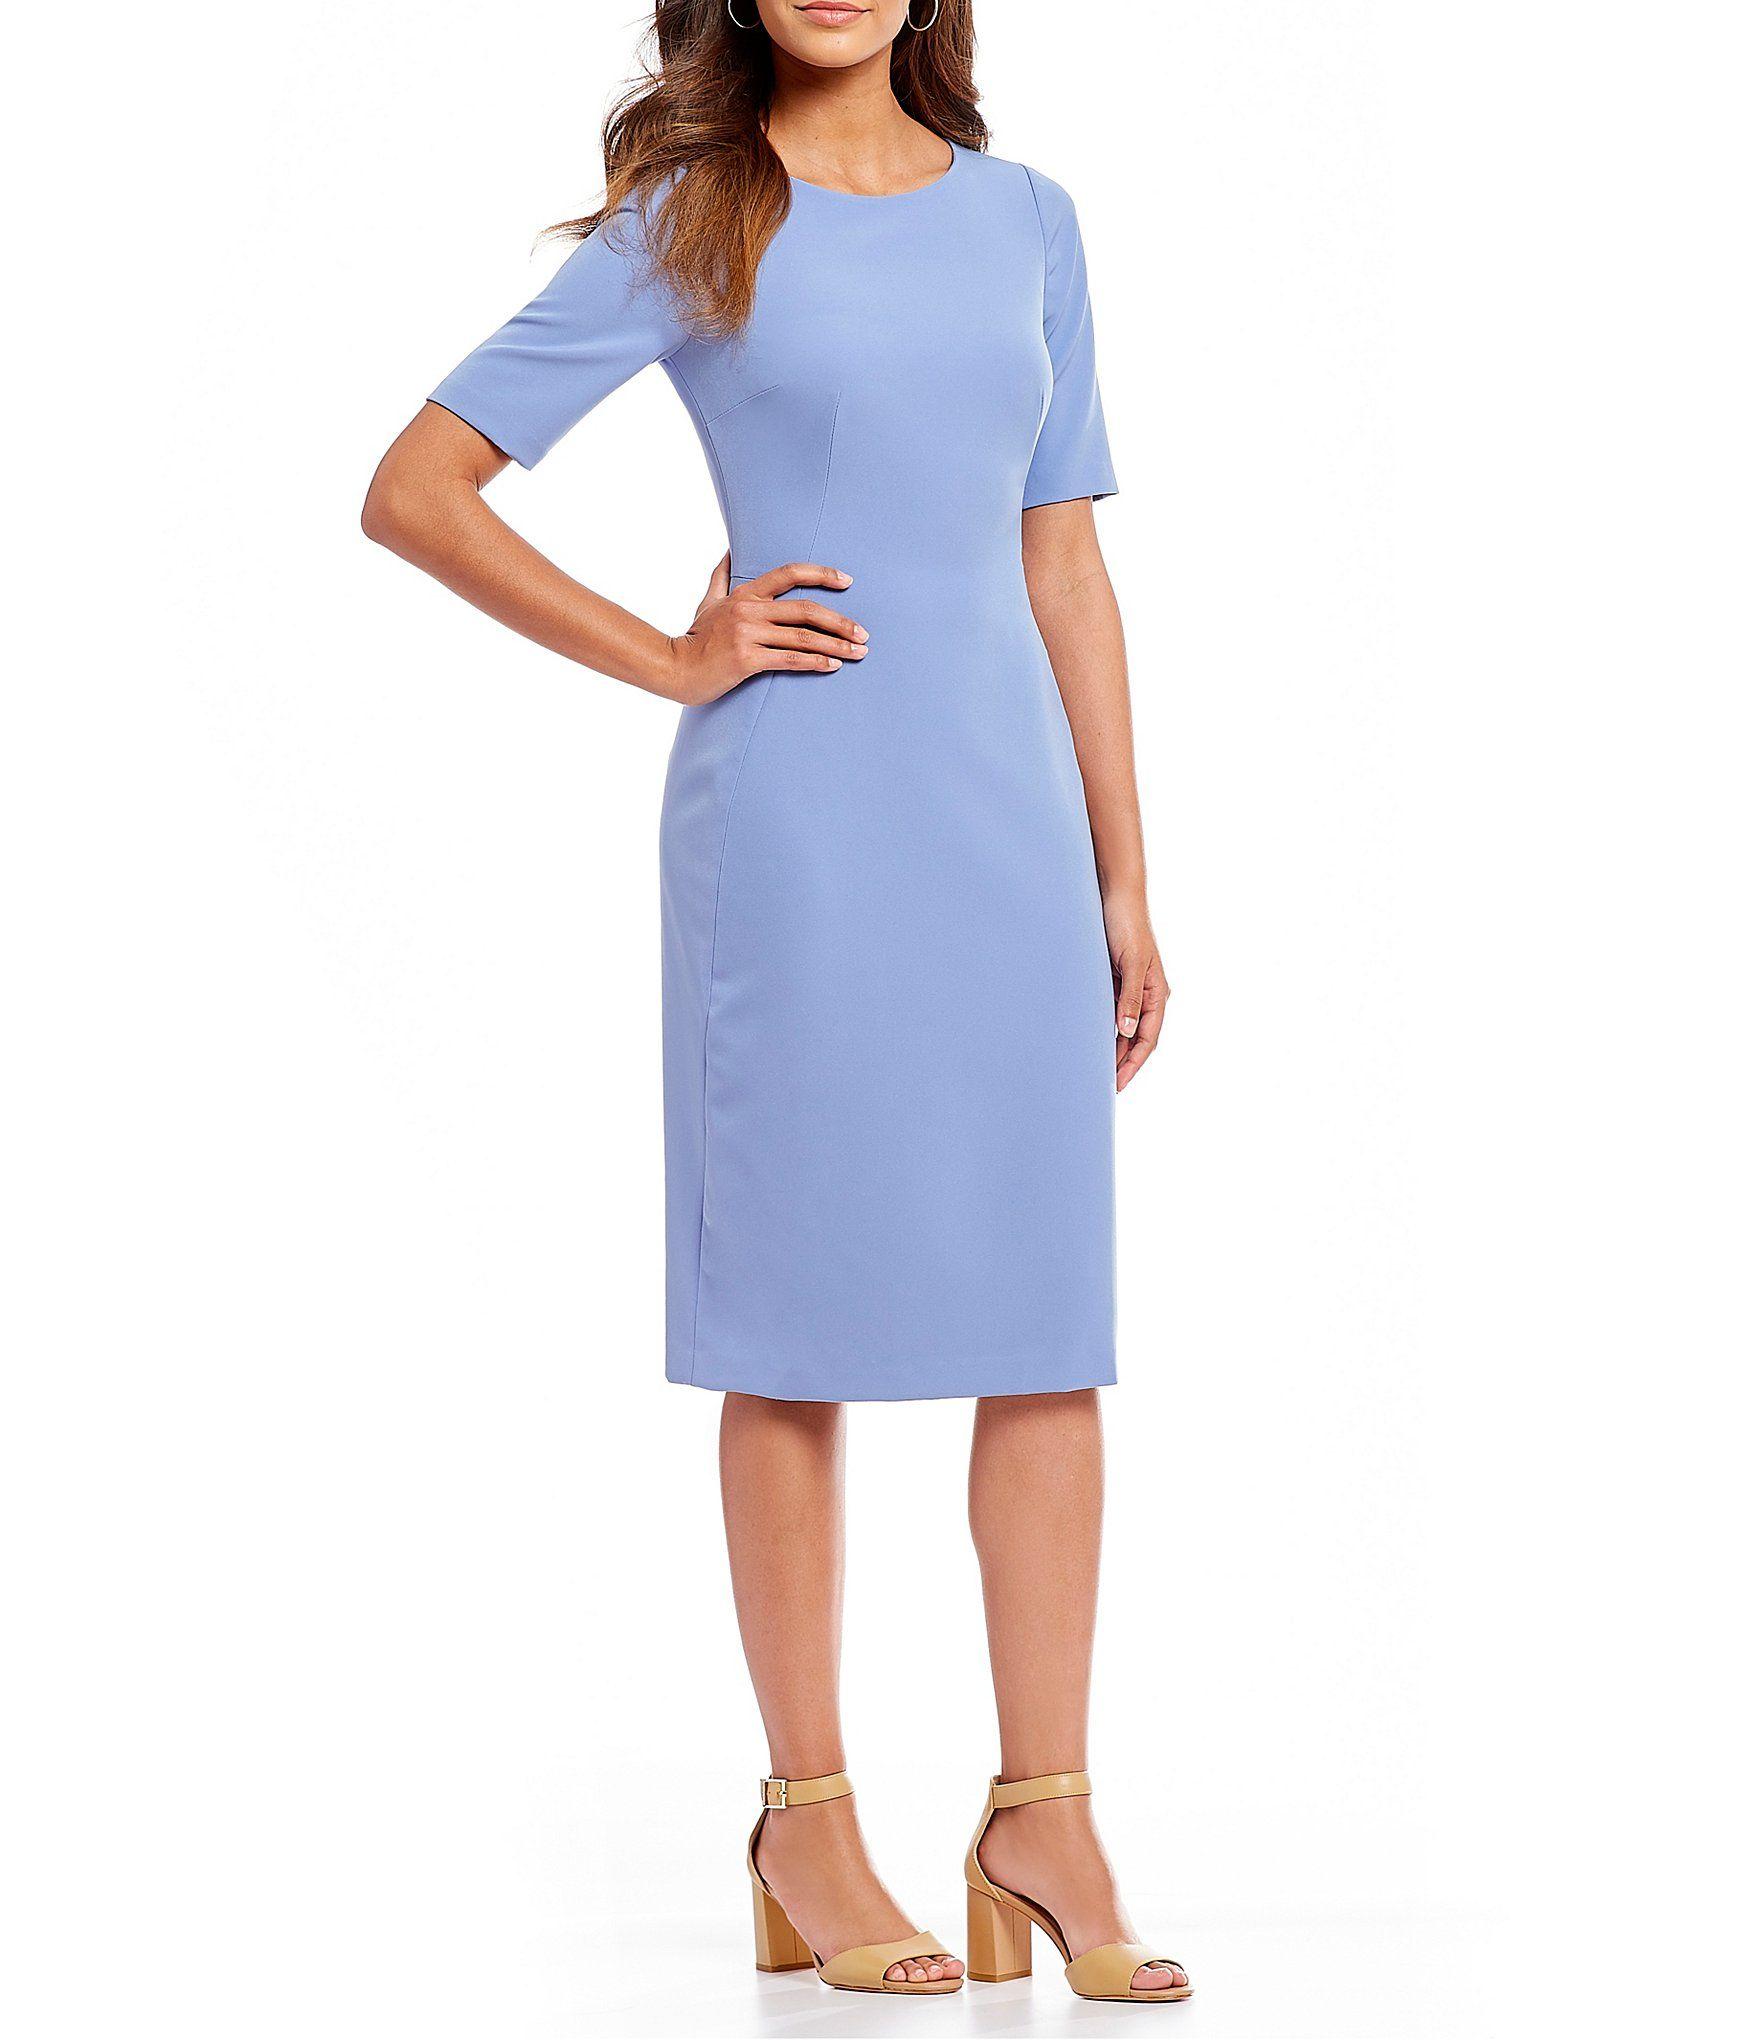 a8d56362bc9 Antonio Melani Sutherland Crepe Dress  Dillards